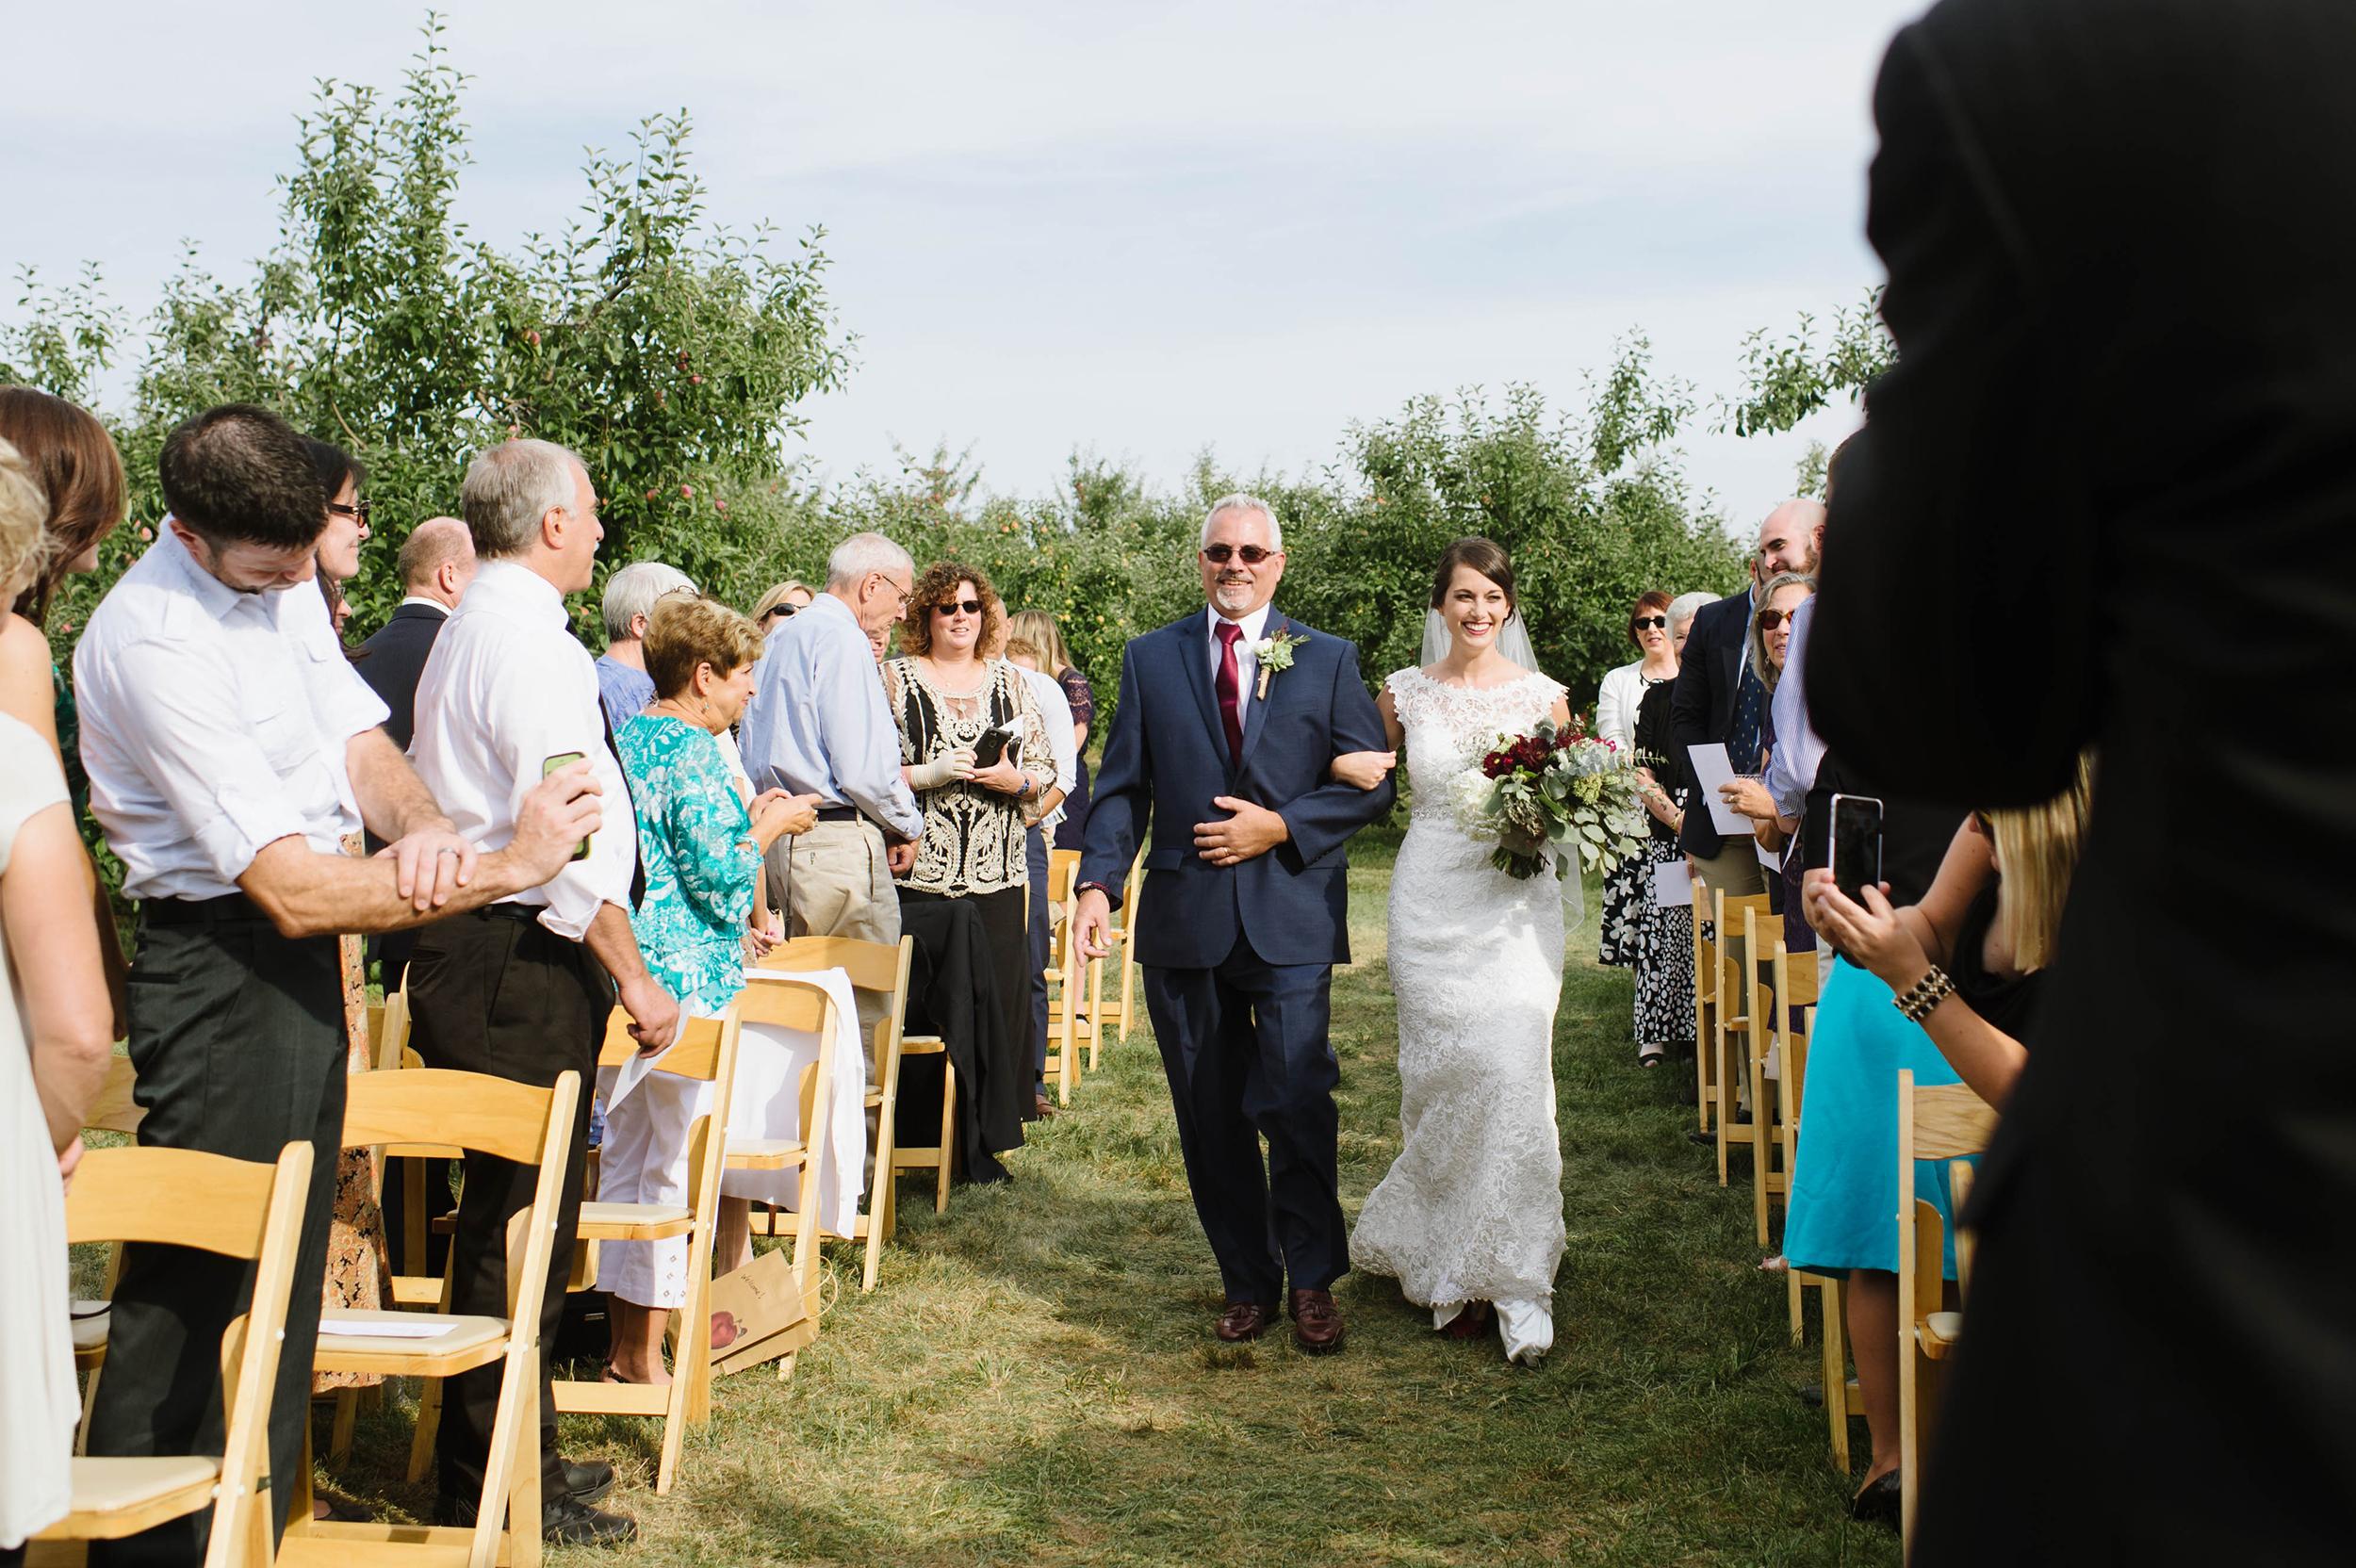 Quonquont-Farm-Wedding014.jpg